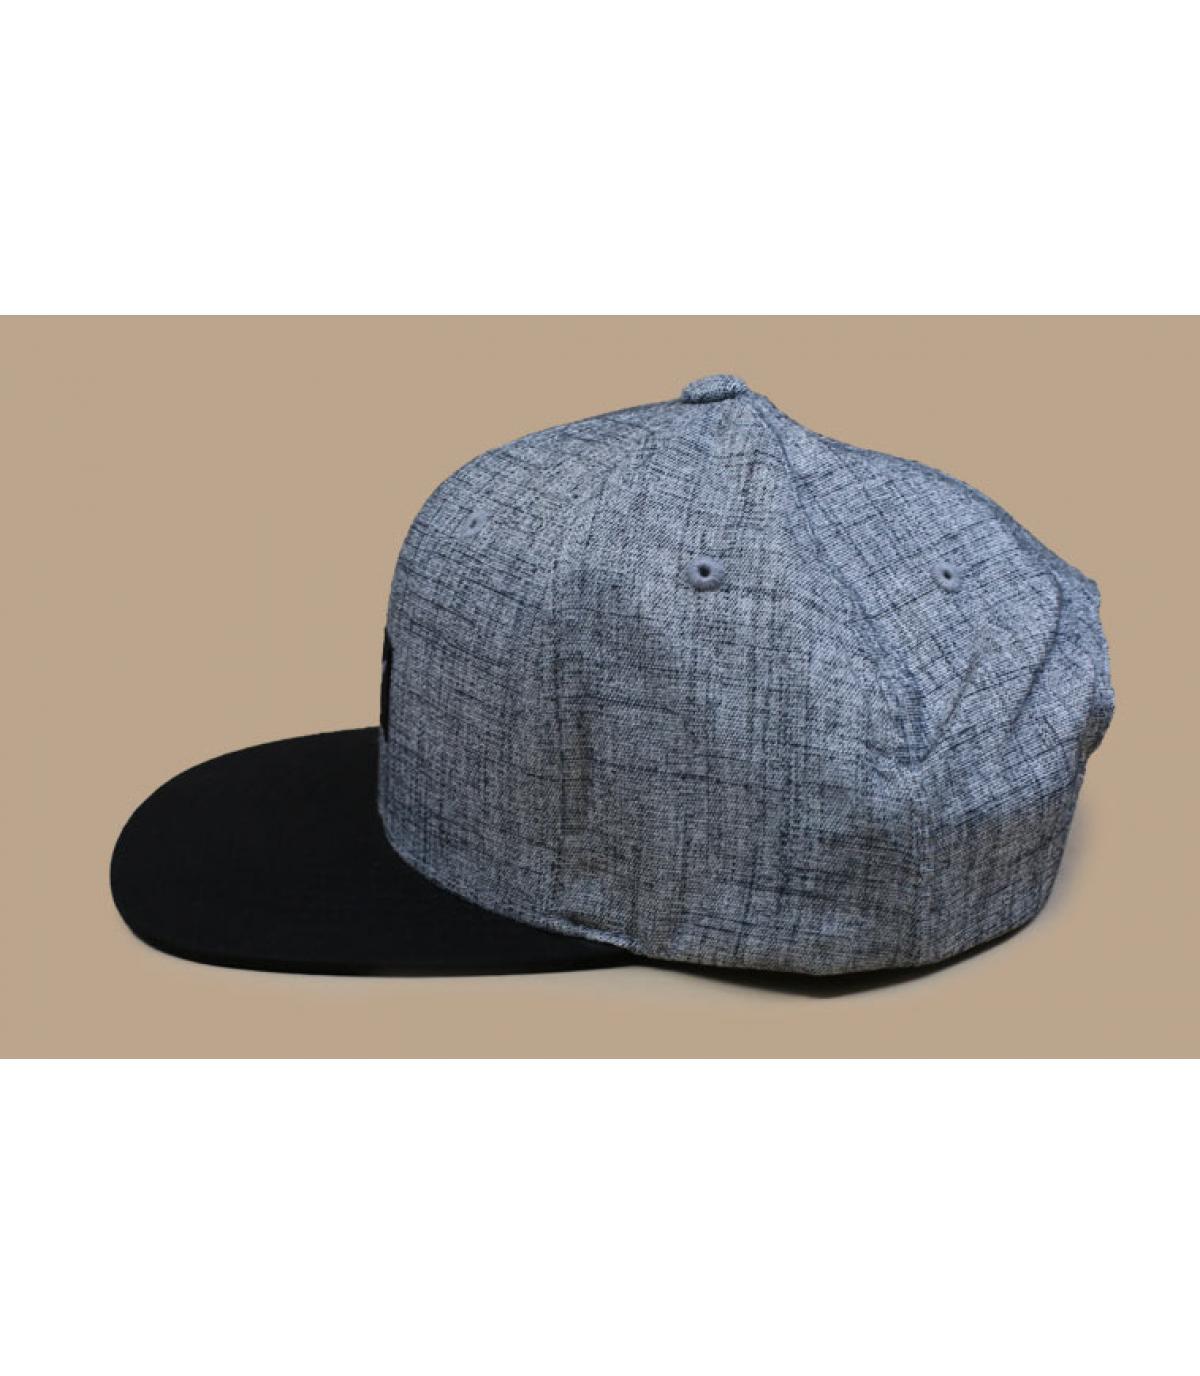 Détails Pitchout heather grey washed black - image 5